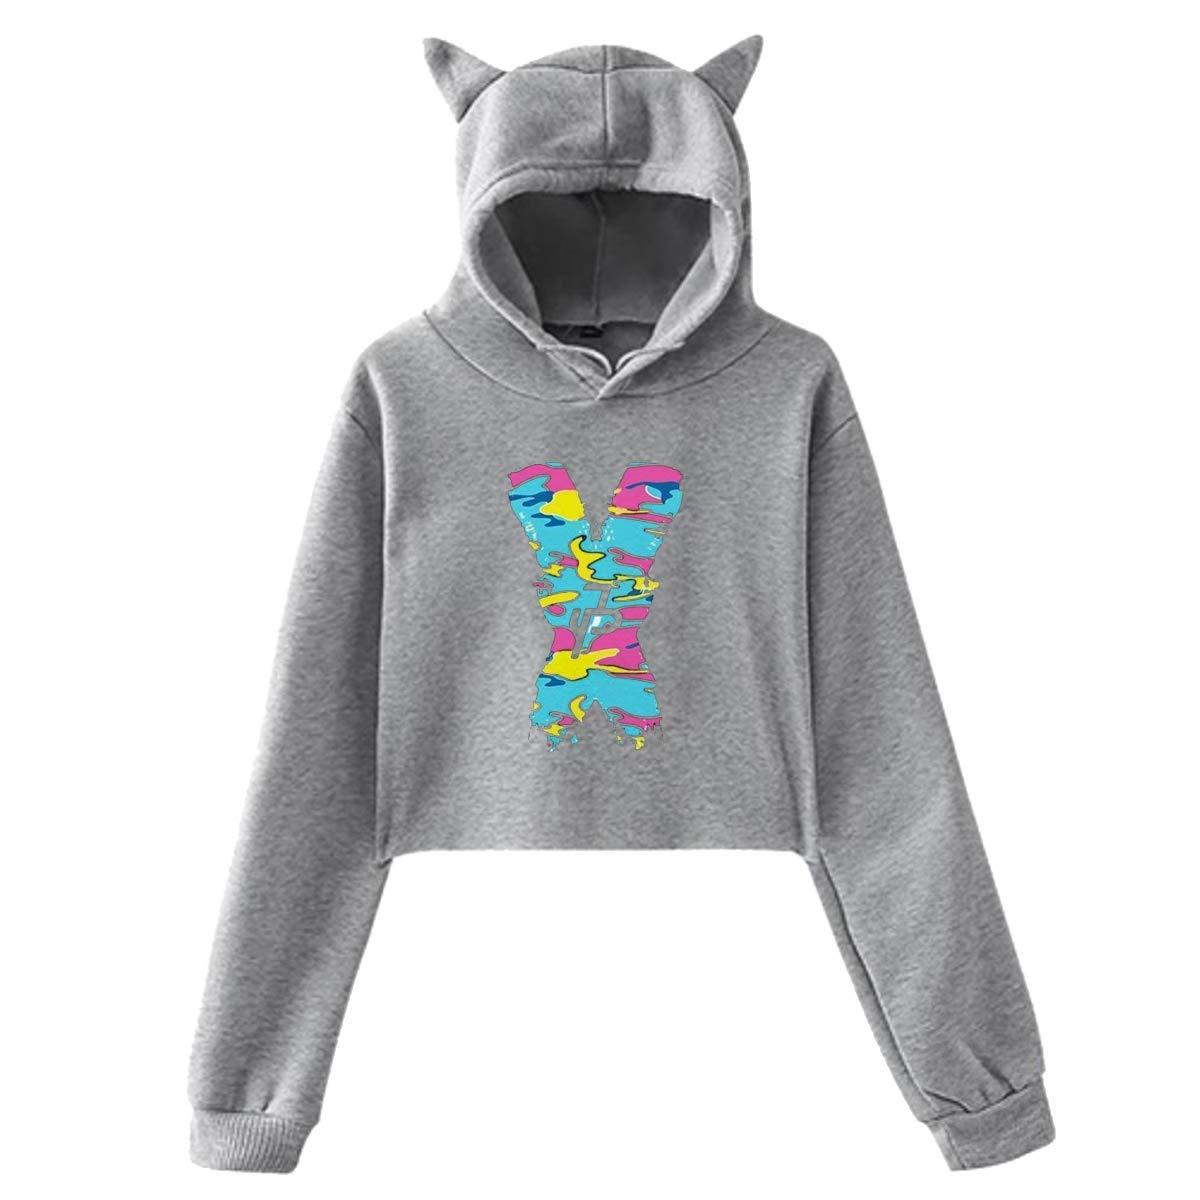 Womens Cat Ear Pullover Hoodie Jake Paul X JP Hooded Sweatshirt Hoodies for Women Girls Clothes Outdoor Sport Coat Tops Gray 29